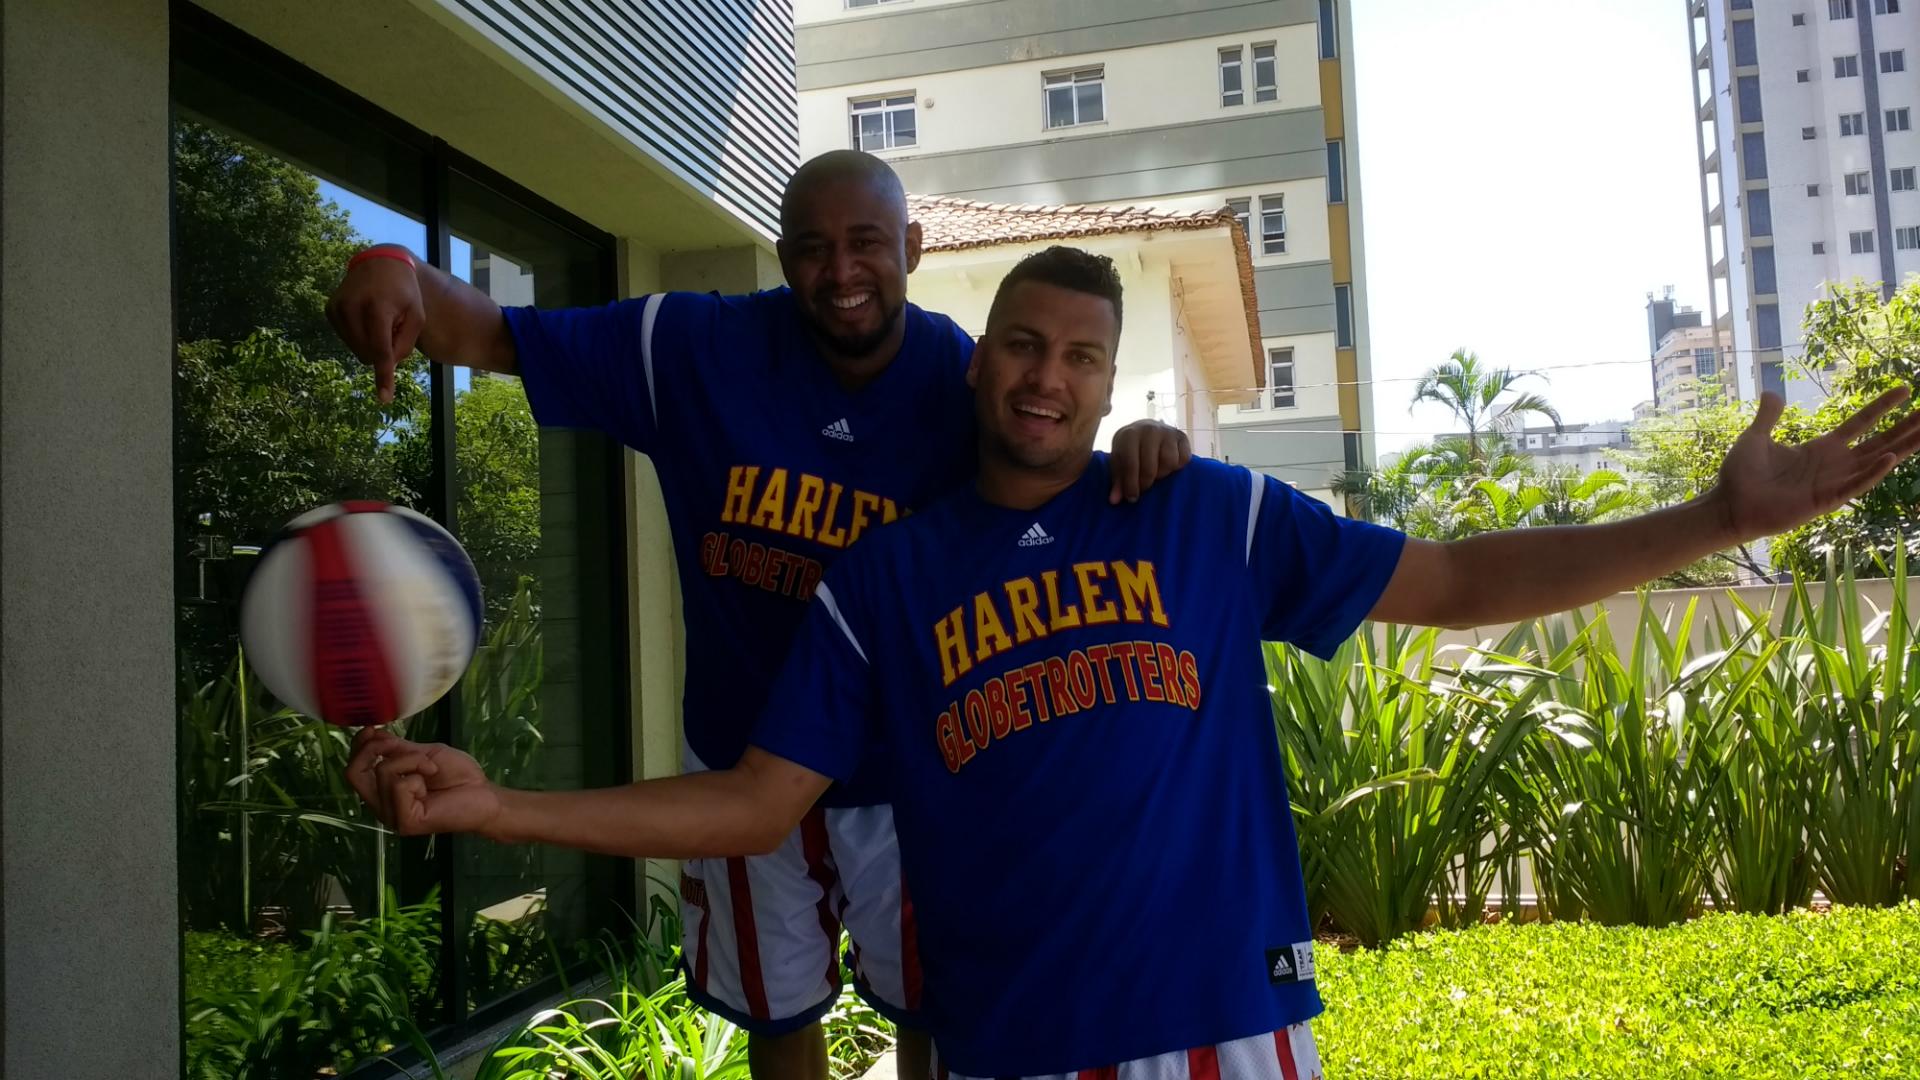 Scooter e El Gato Harlem Globettroters